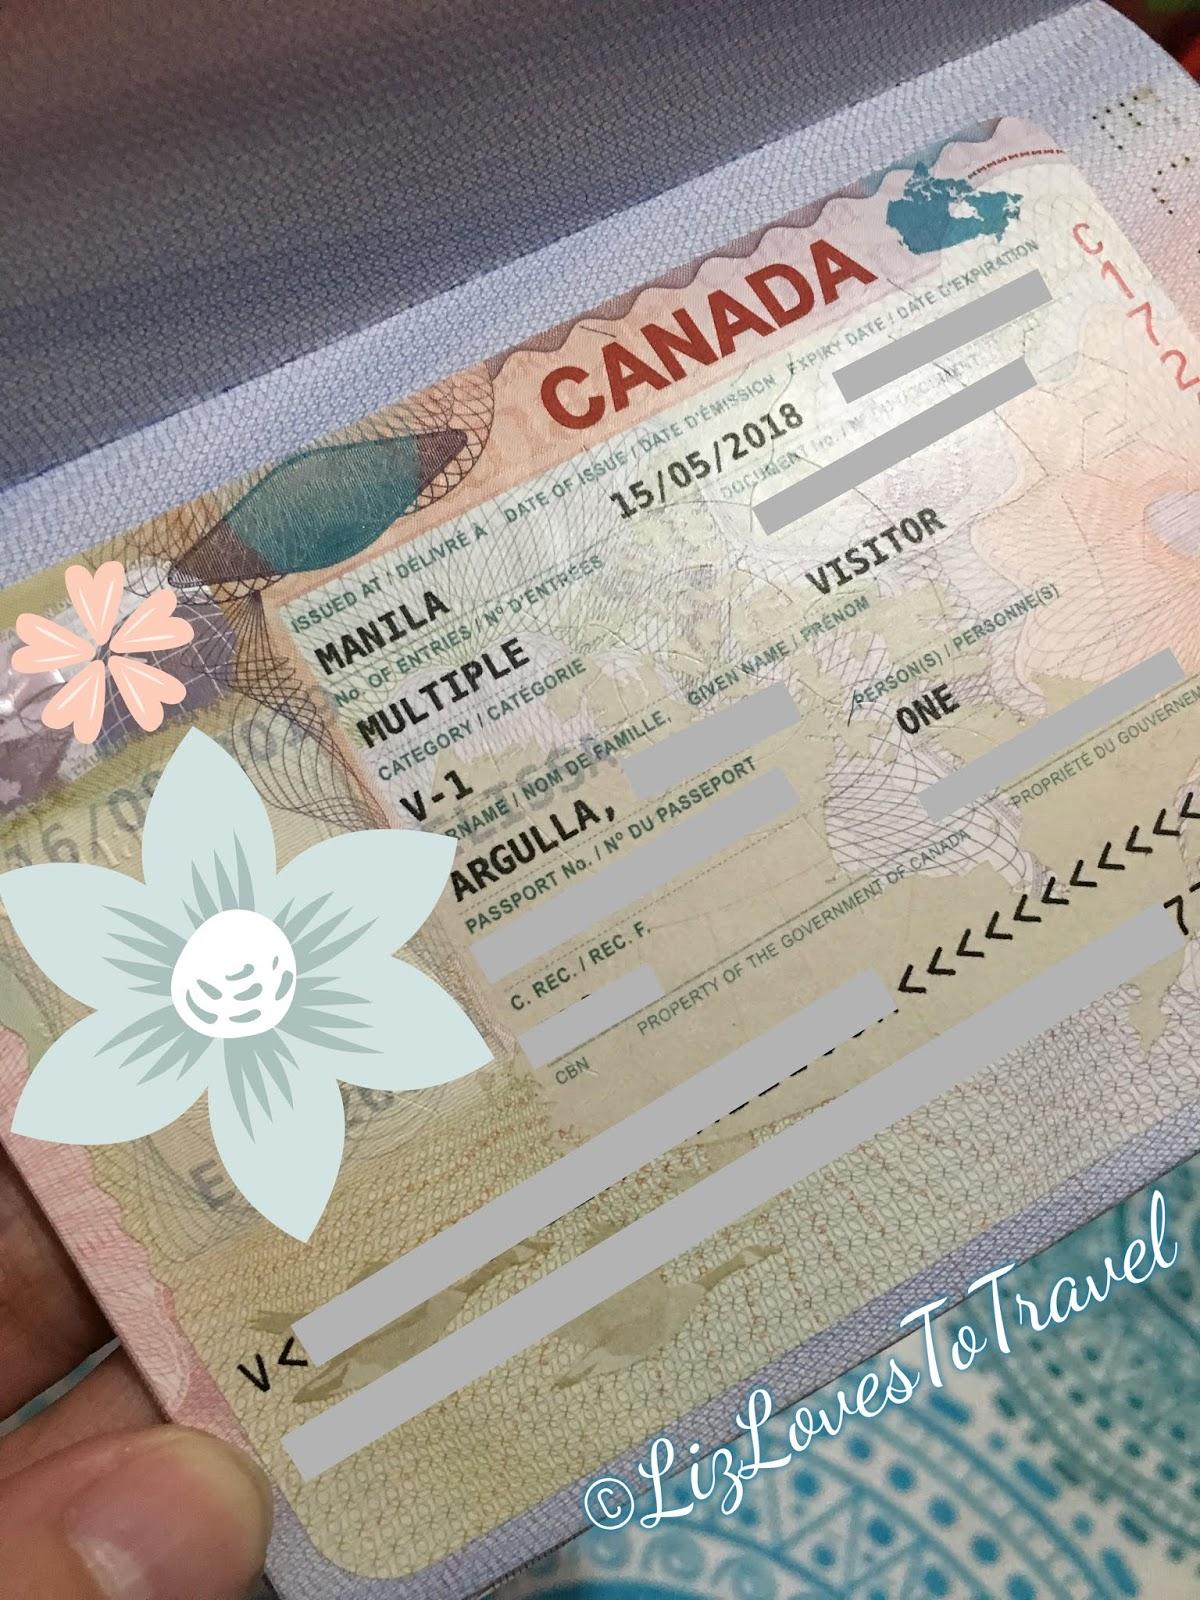 Canada Tourist Visa Application for Filipinos - The Bookworm